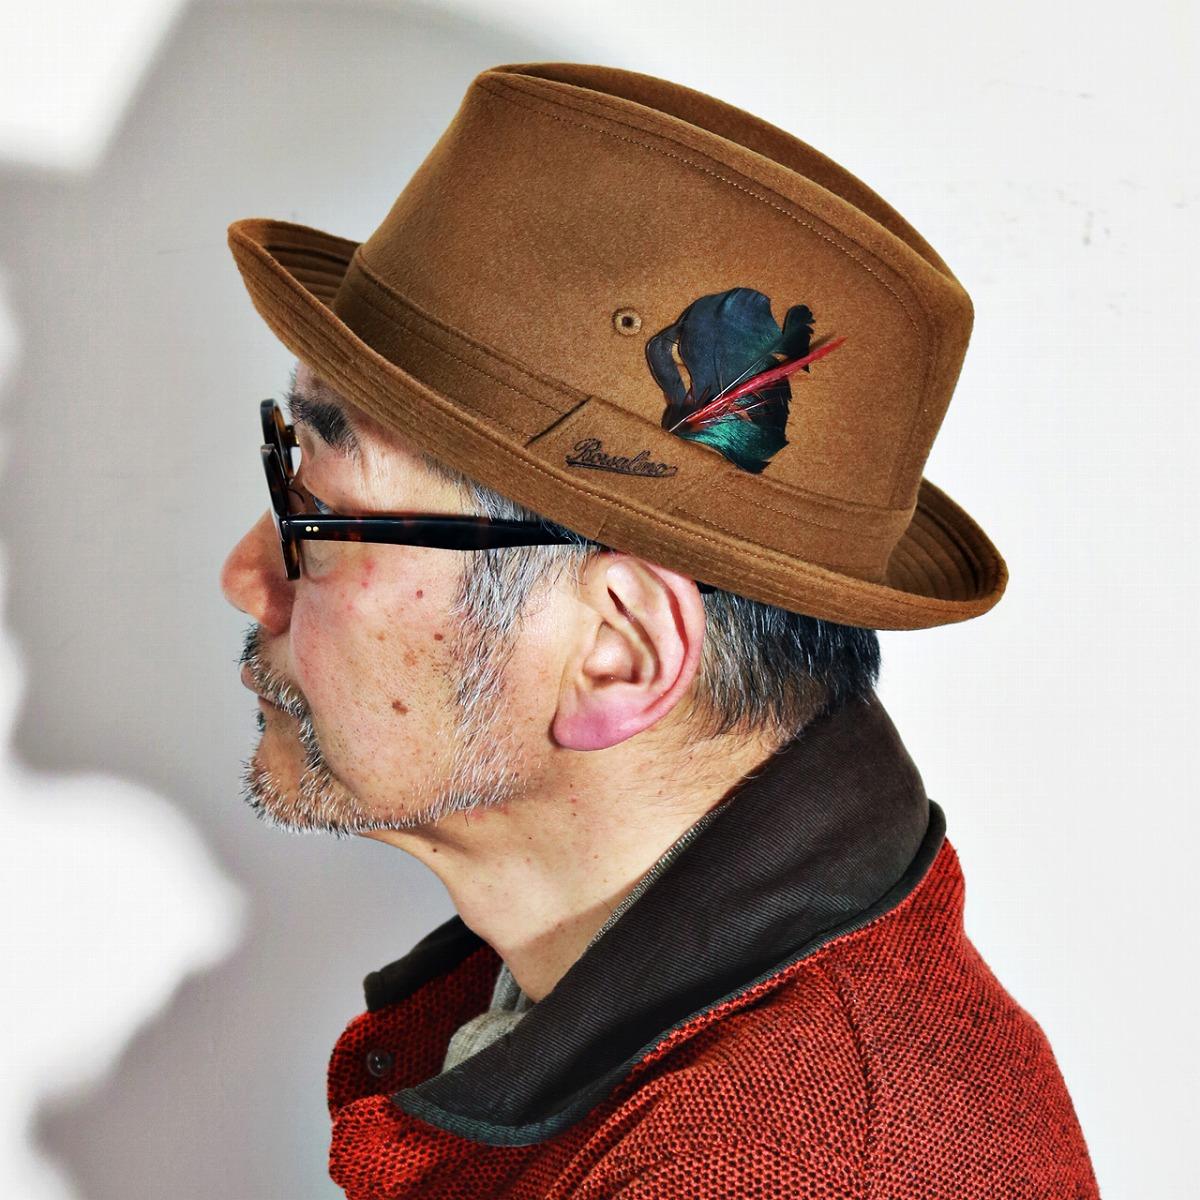 42efdb2d829 Elehelm hat store rakuten global market hats mens oak miya jpg 1200x1200  Hats fall autumn